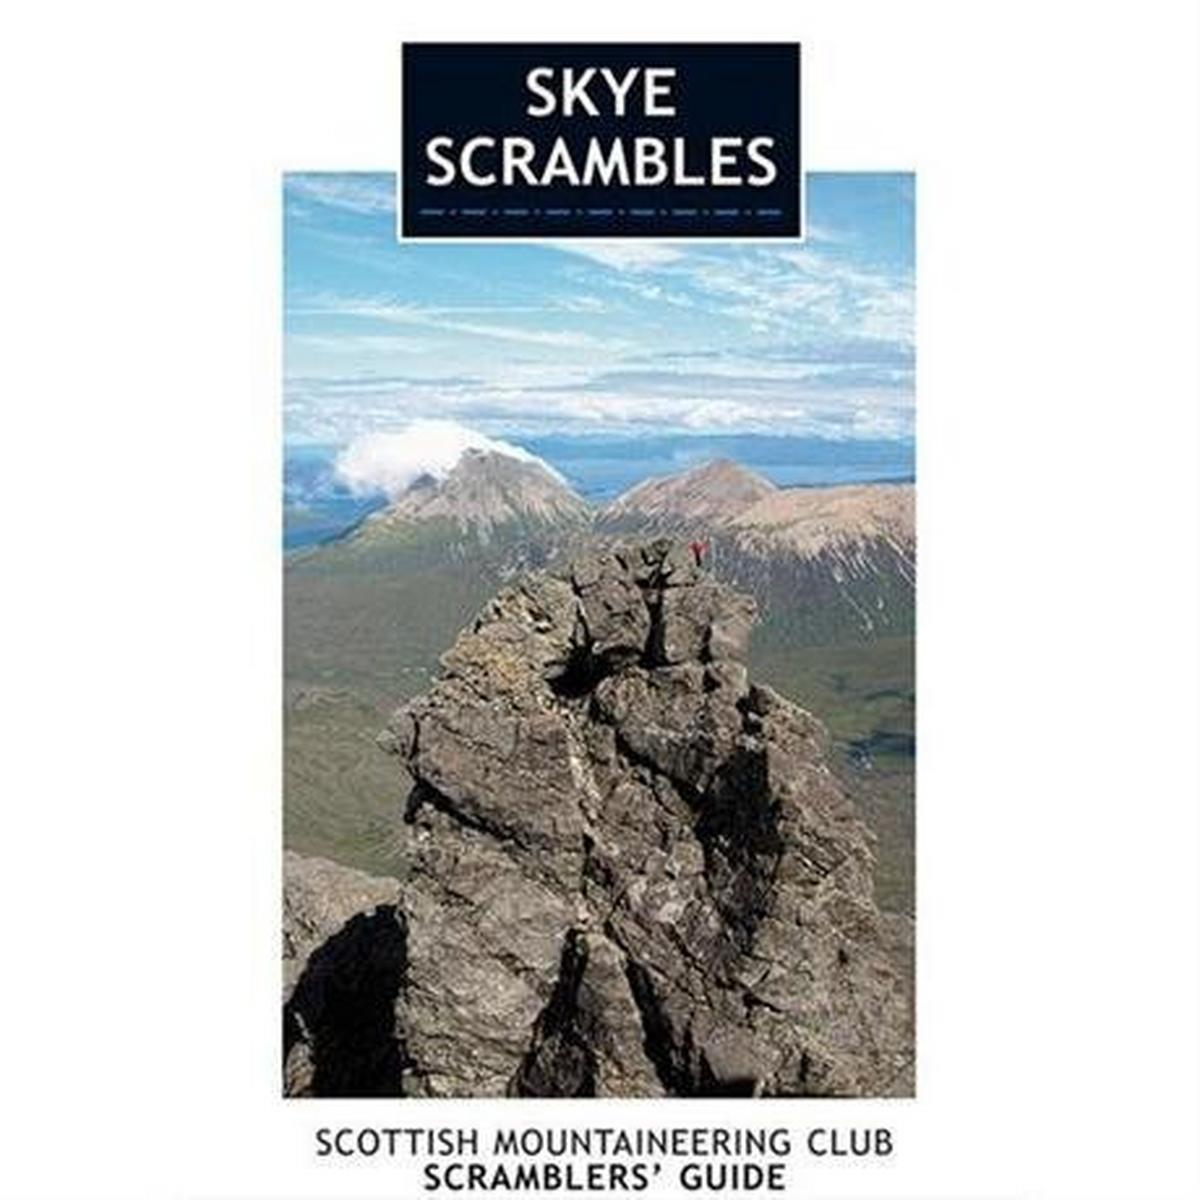 Cordee SMC Climbing Guide Book: Skye Scrambles